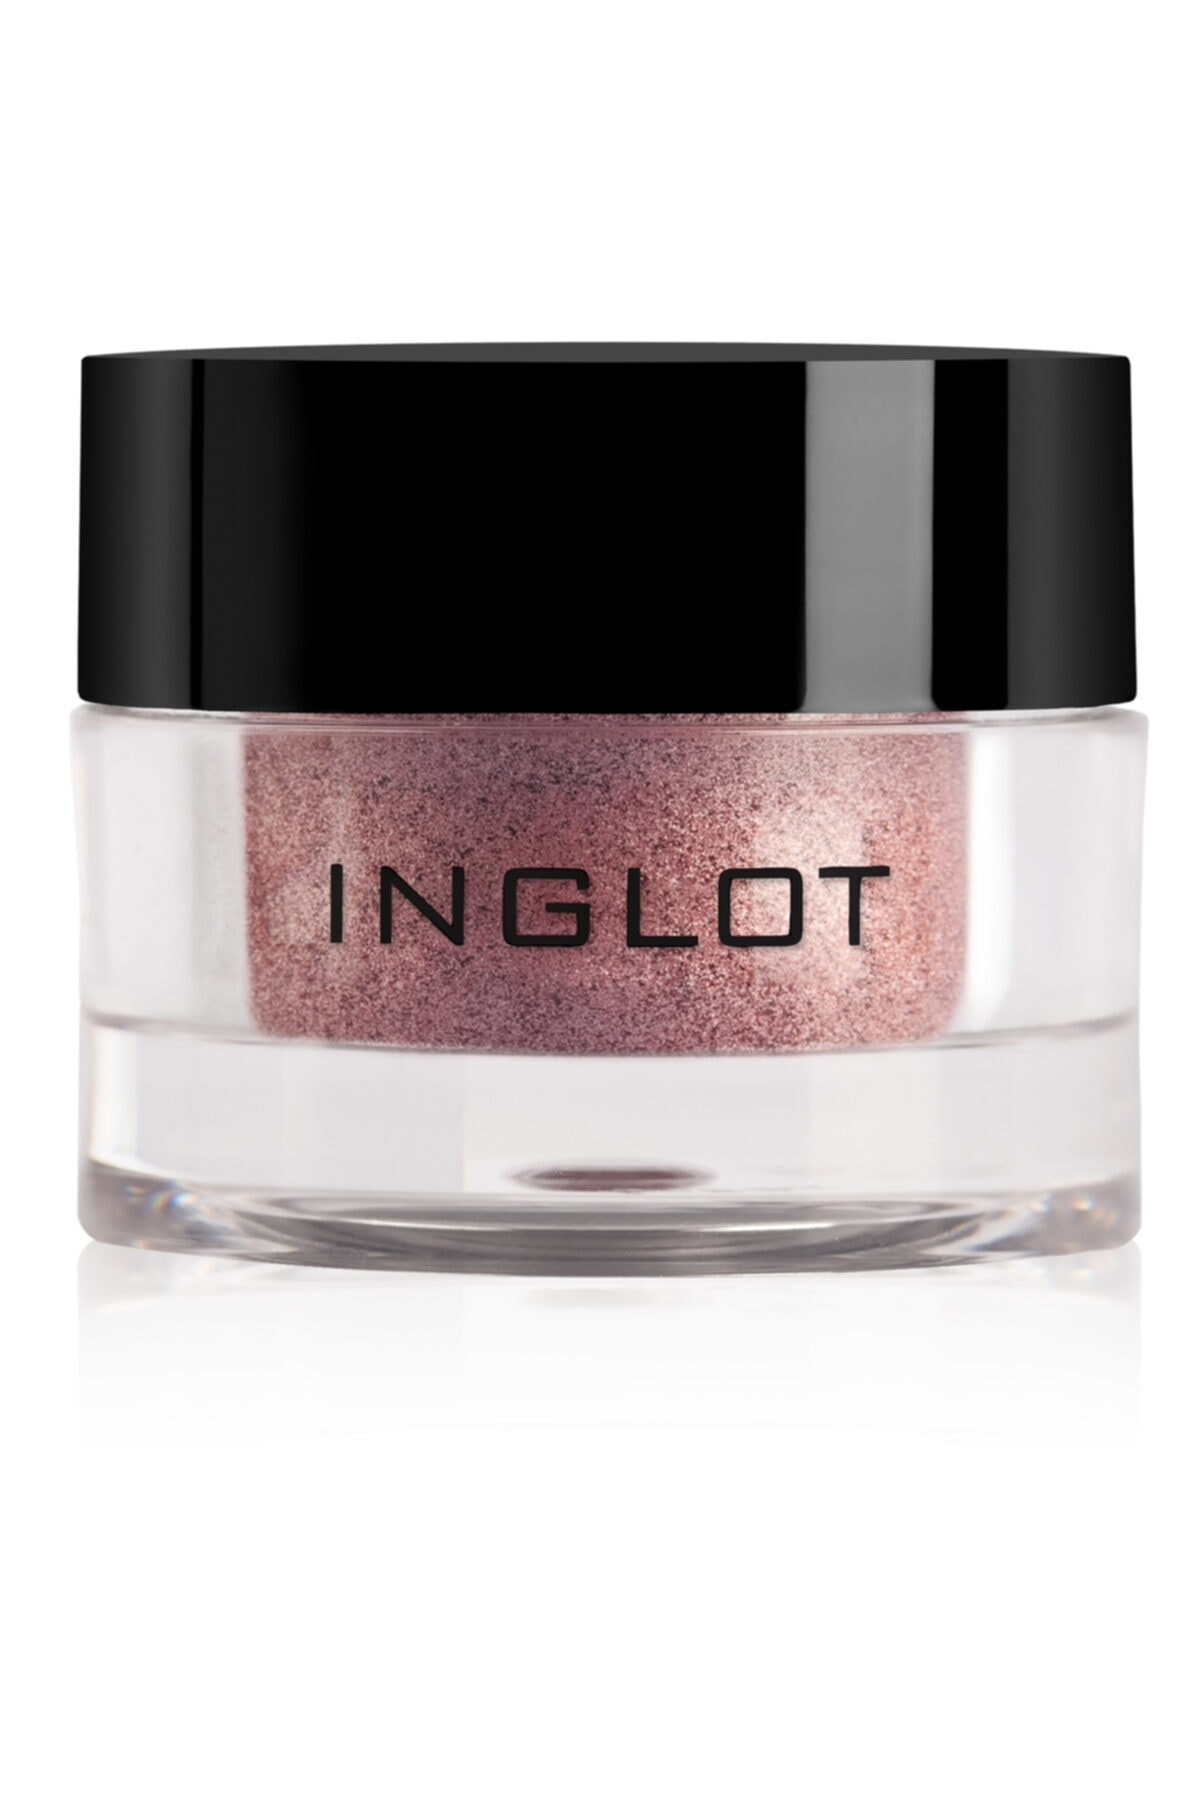 INGLOT Göz Farı-amc Pure Pigment Eye Shadow 61 1